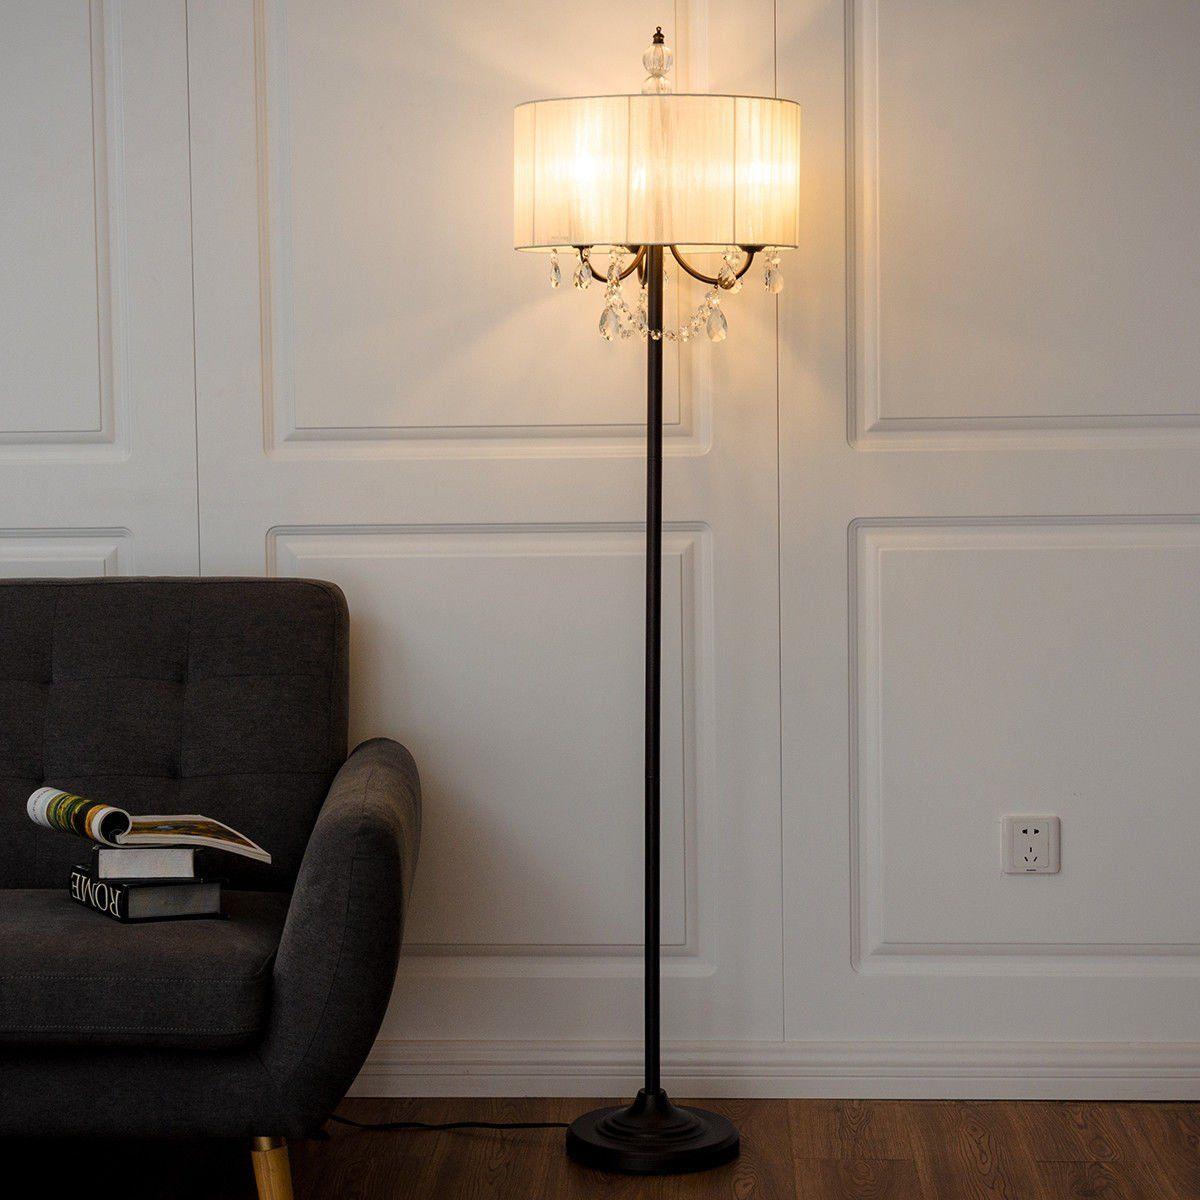 Safstar Elegant Sheer Shade Floor Lamp 61 Inch Height with